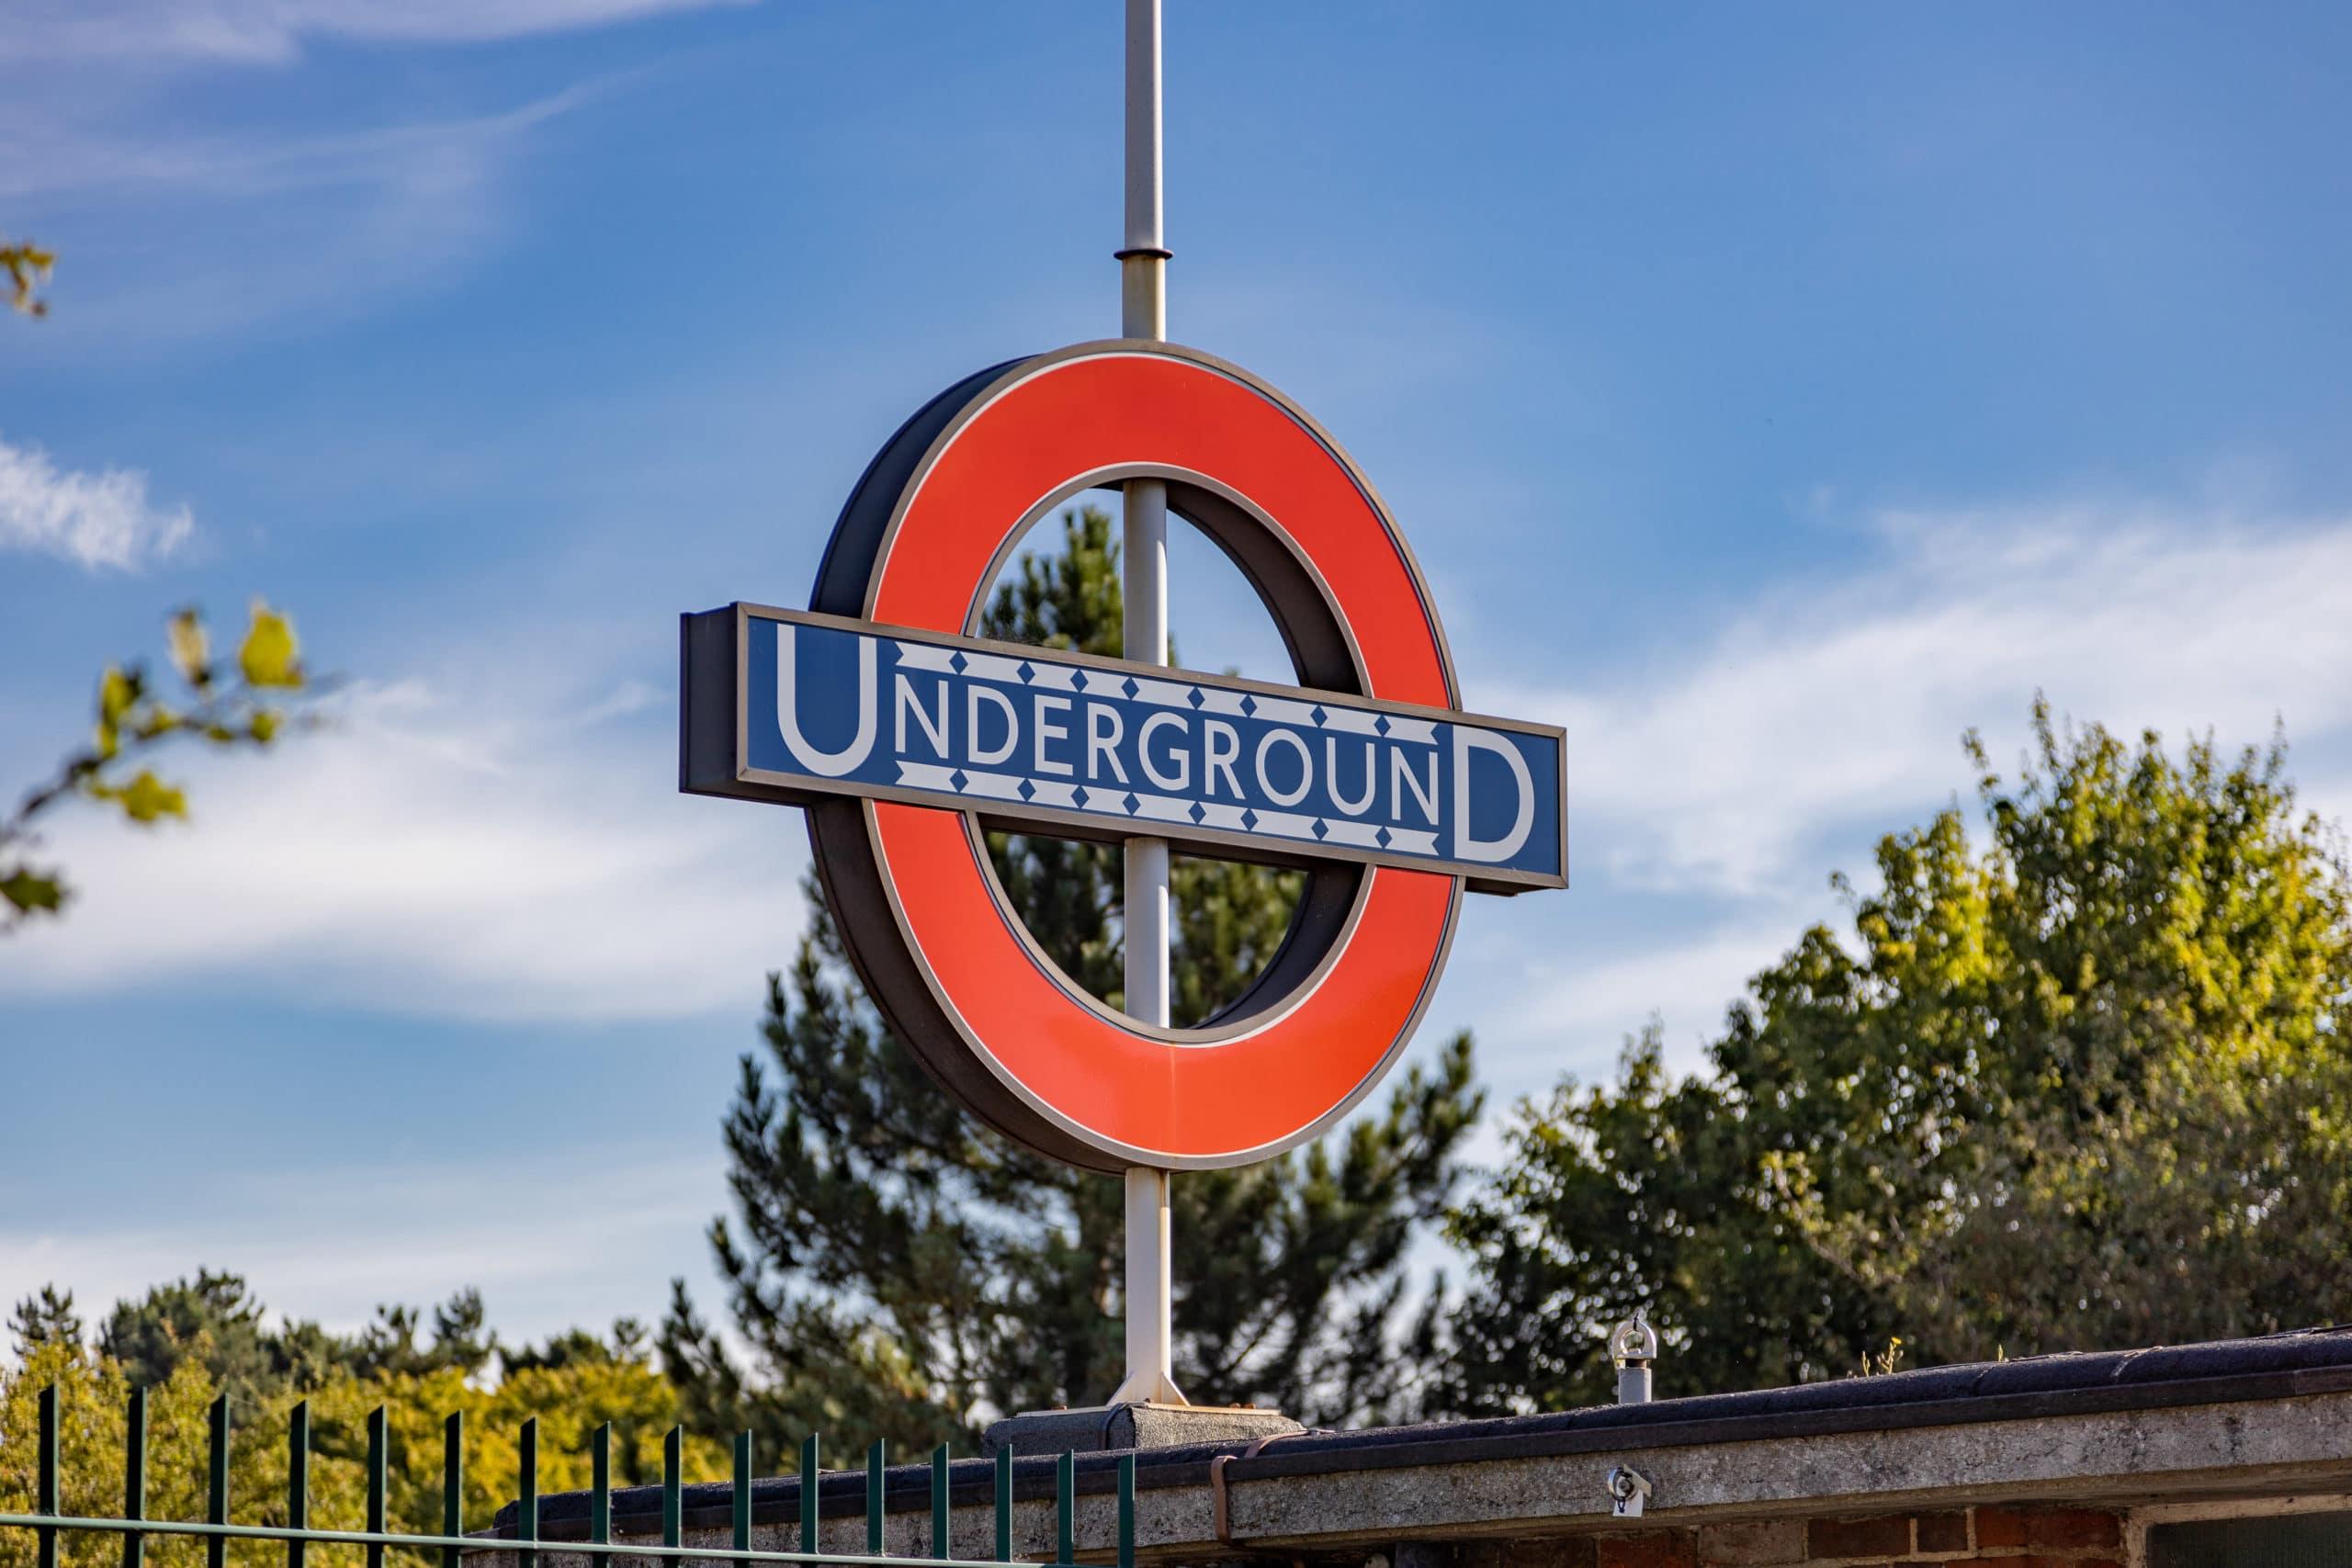 Oakwood tube station Underground sign, a short walk from Trent Park